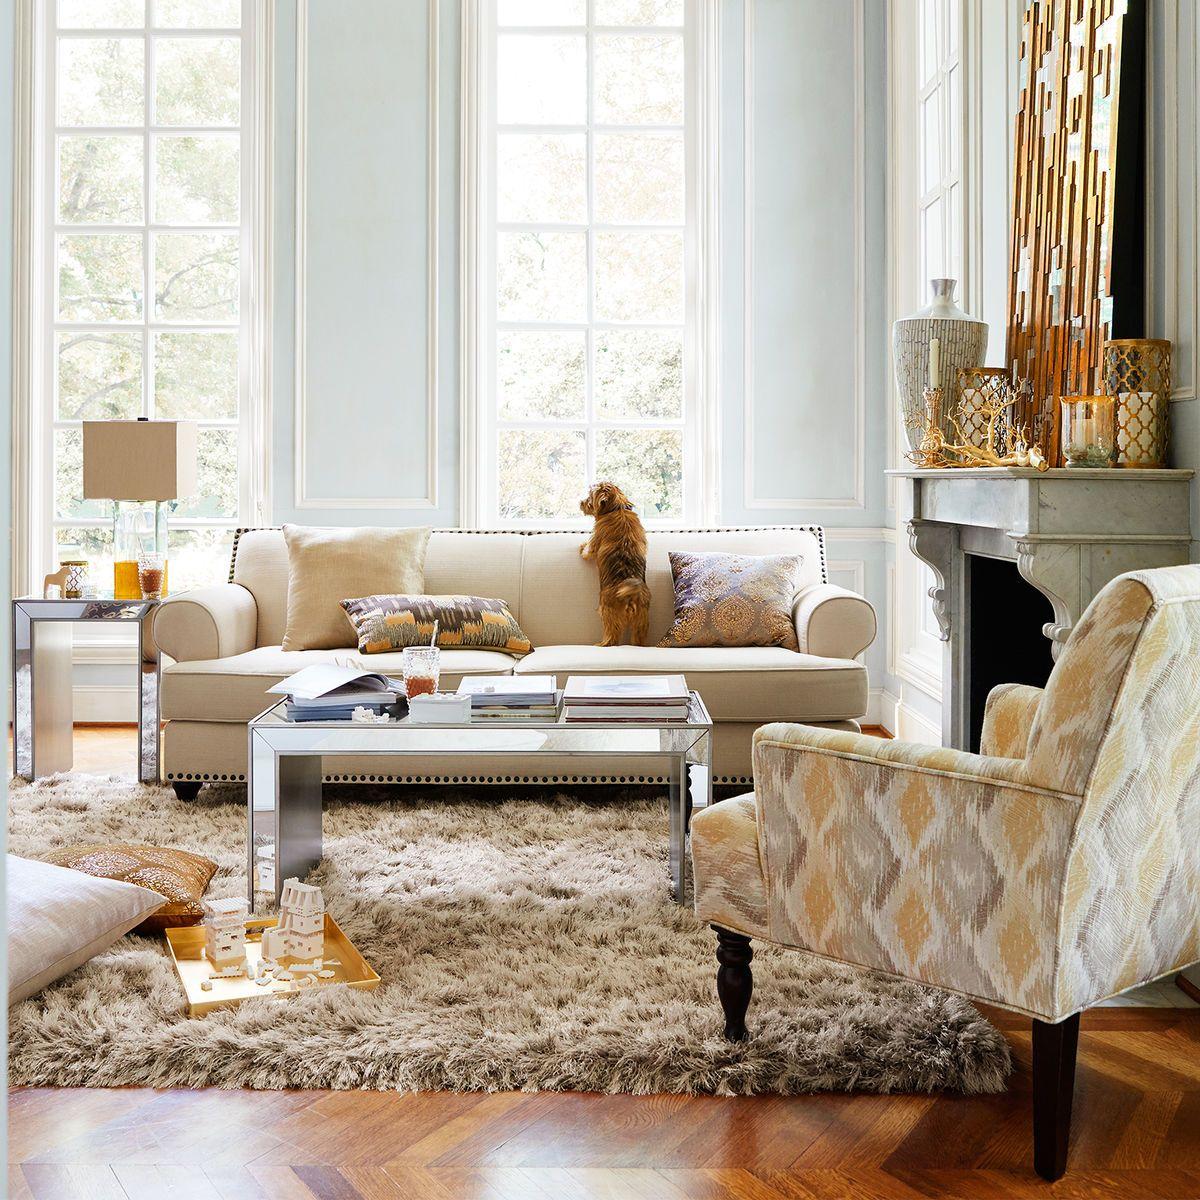 Grand Champagne Shag Rug | Shag rugs, Grand champagne and Spaces